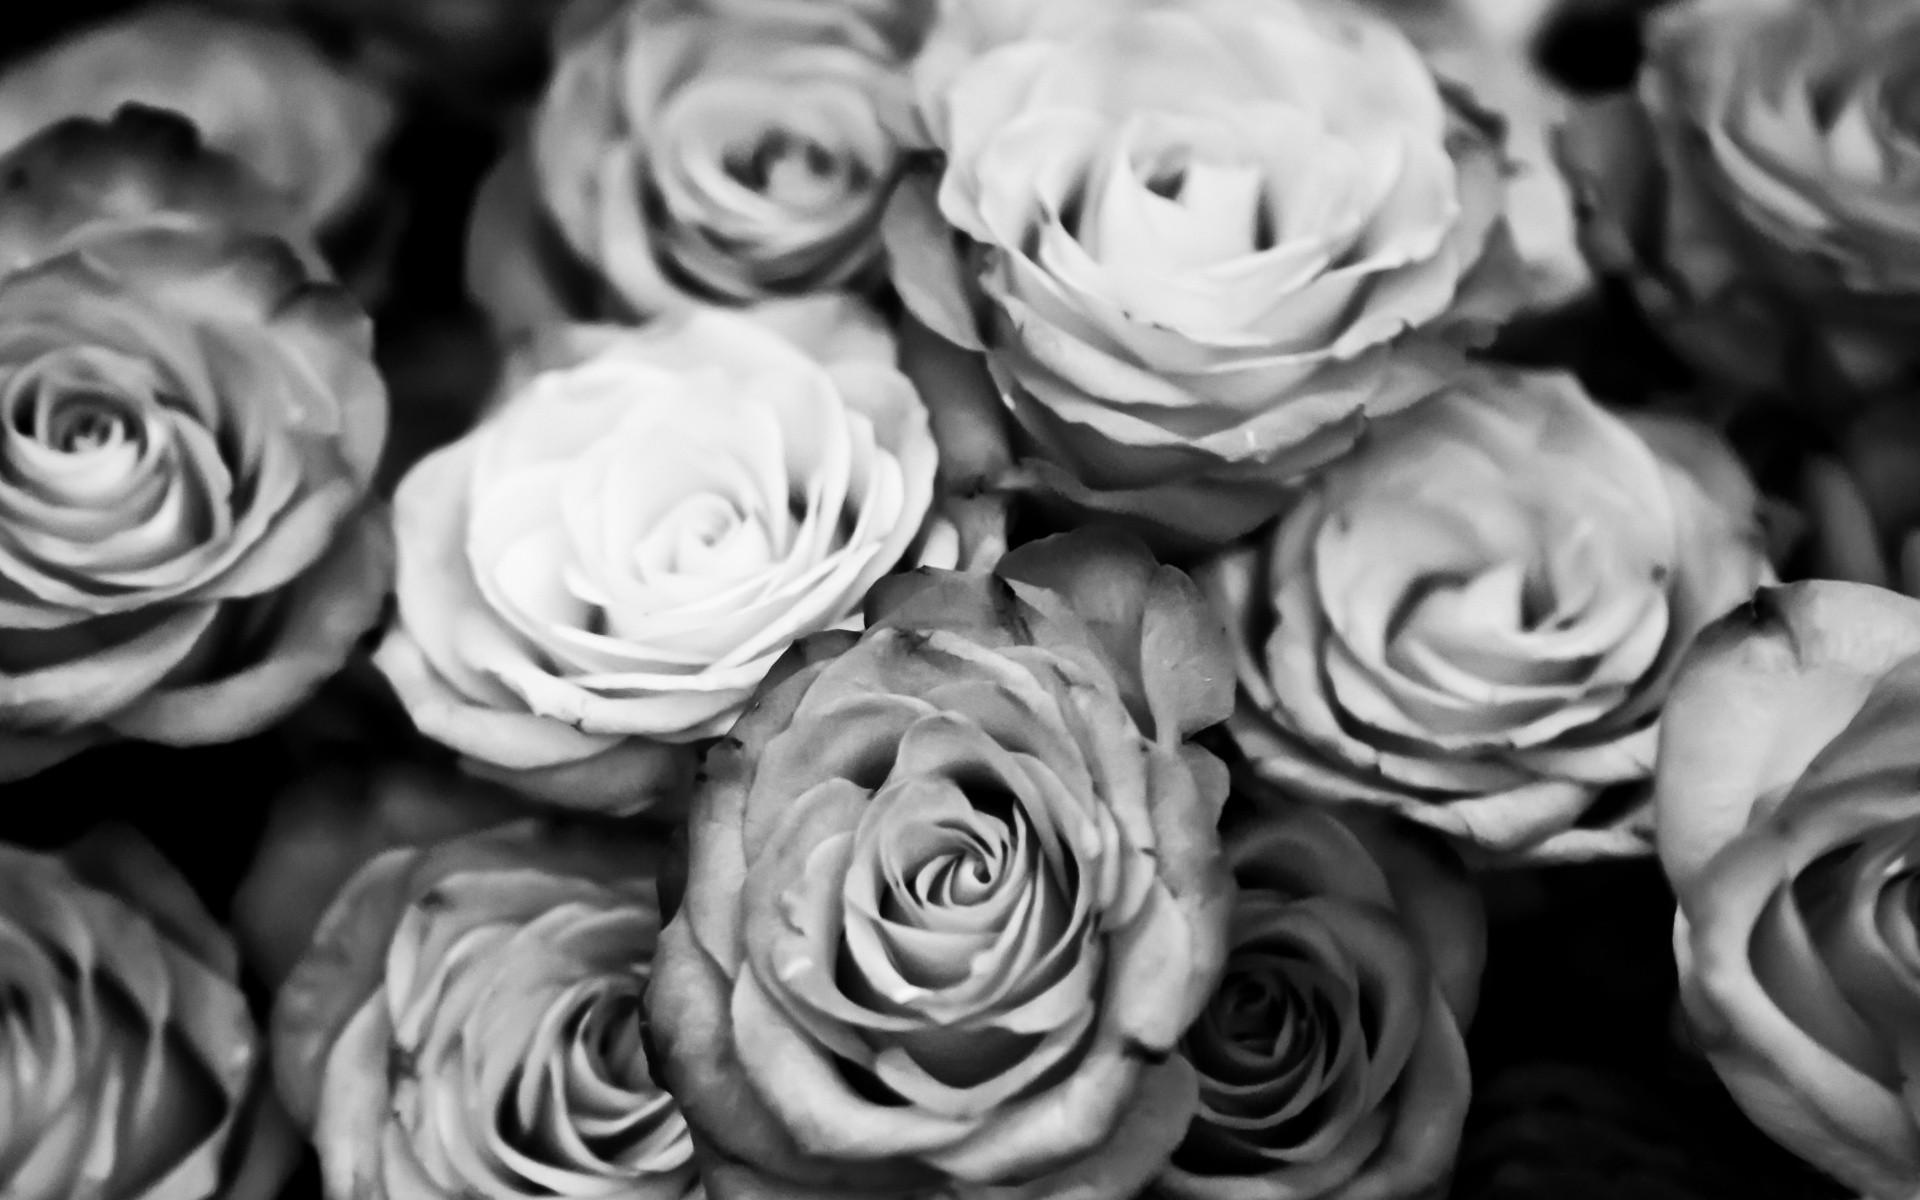 Black Rose Iphone Wallpaper Roses Background Images 183 ①